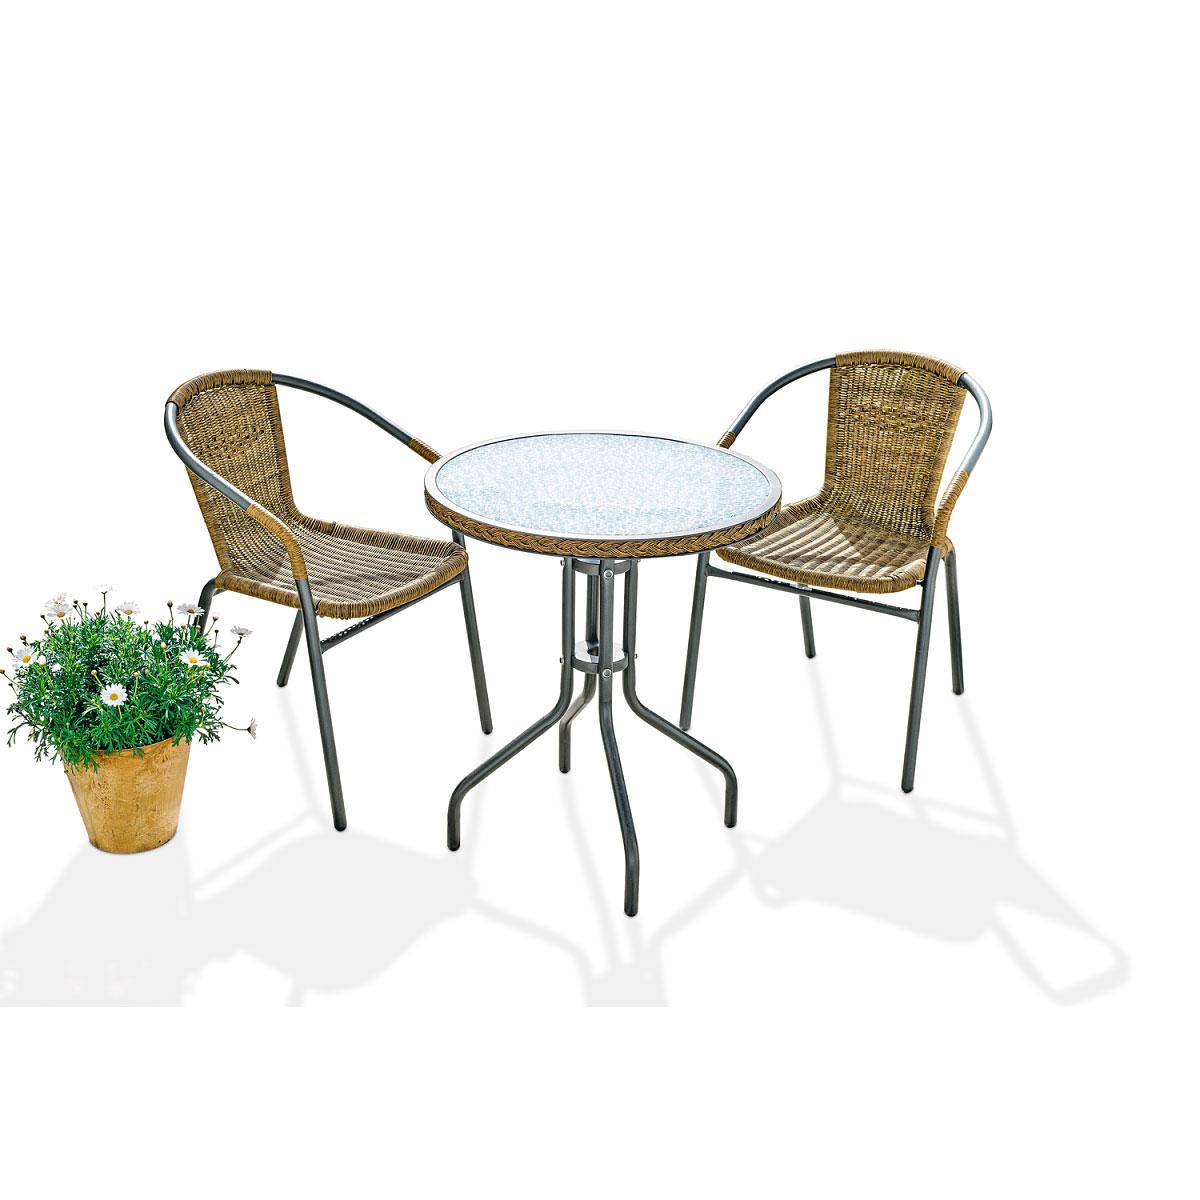 "Gartenmöbel Sets - Balkonset ""Tobago"", 3tlg.  - Onlineshop Hellweg"